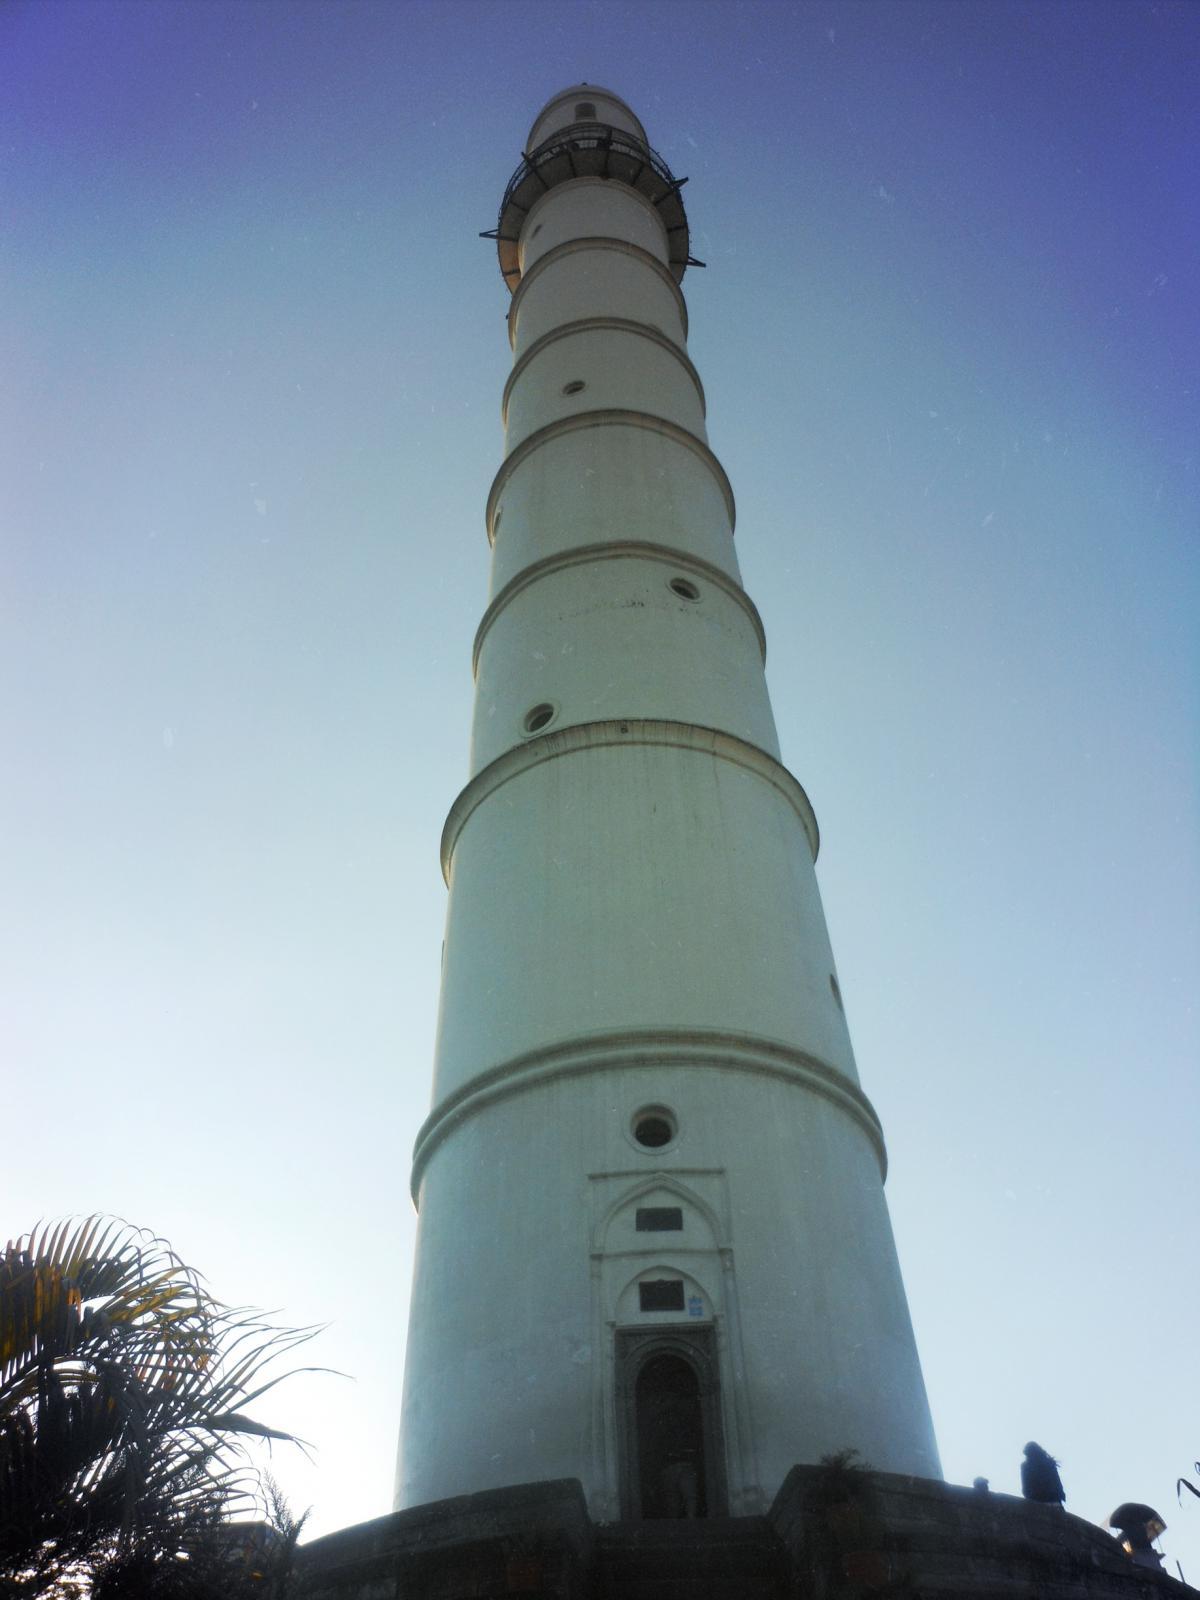 lighthouse architecture sky